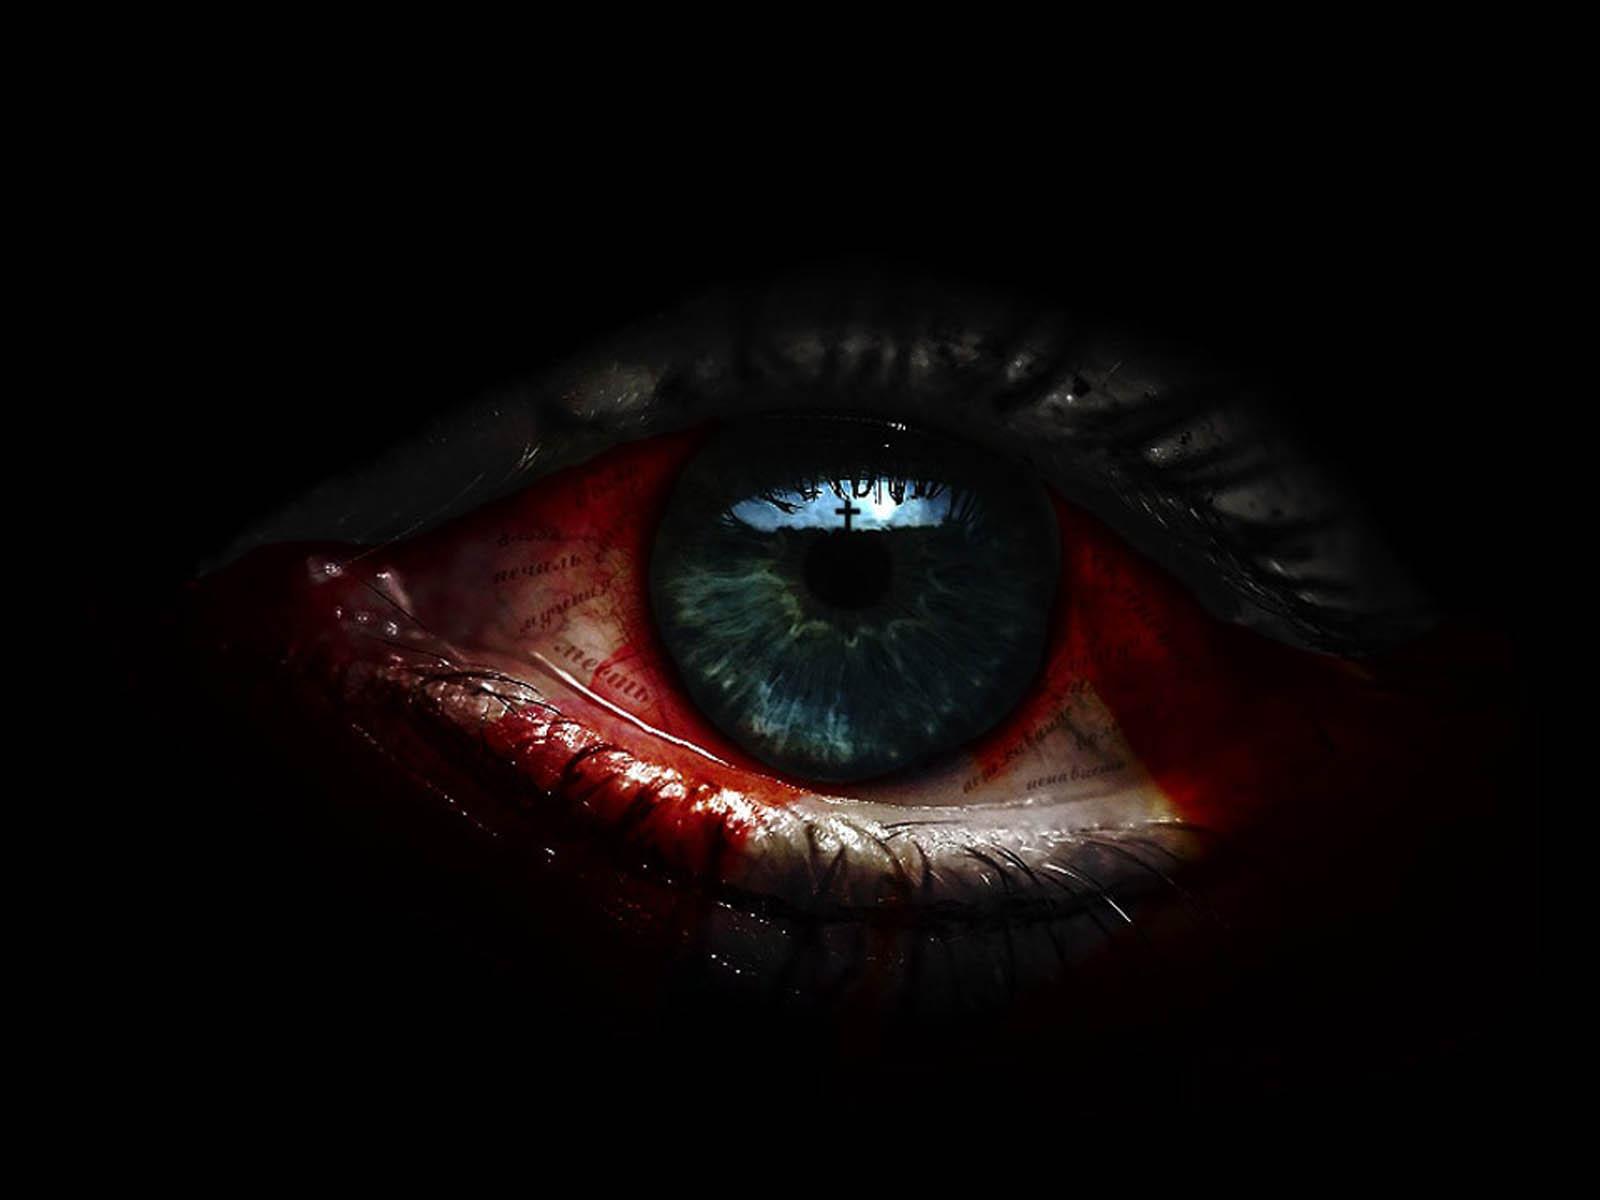 wallpaper: Horror Eye Wallpapers